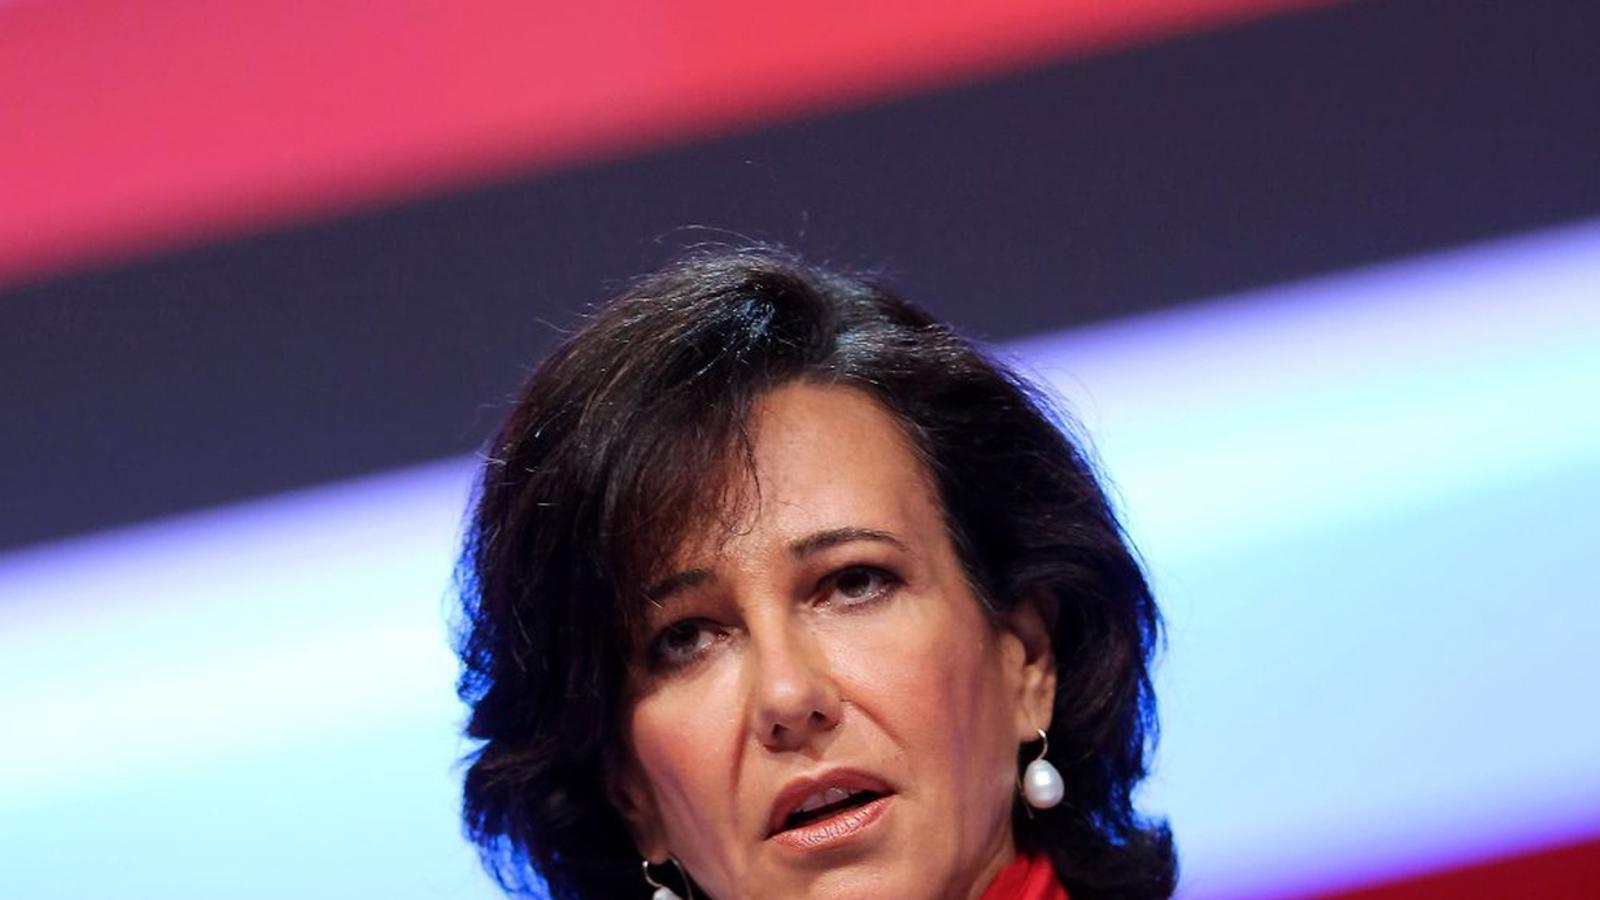 La presidenta del Banc Santander, Ana Botín, en una imatge d'arxiu.